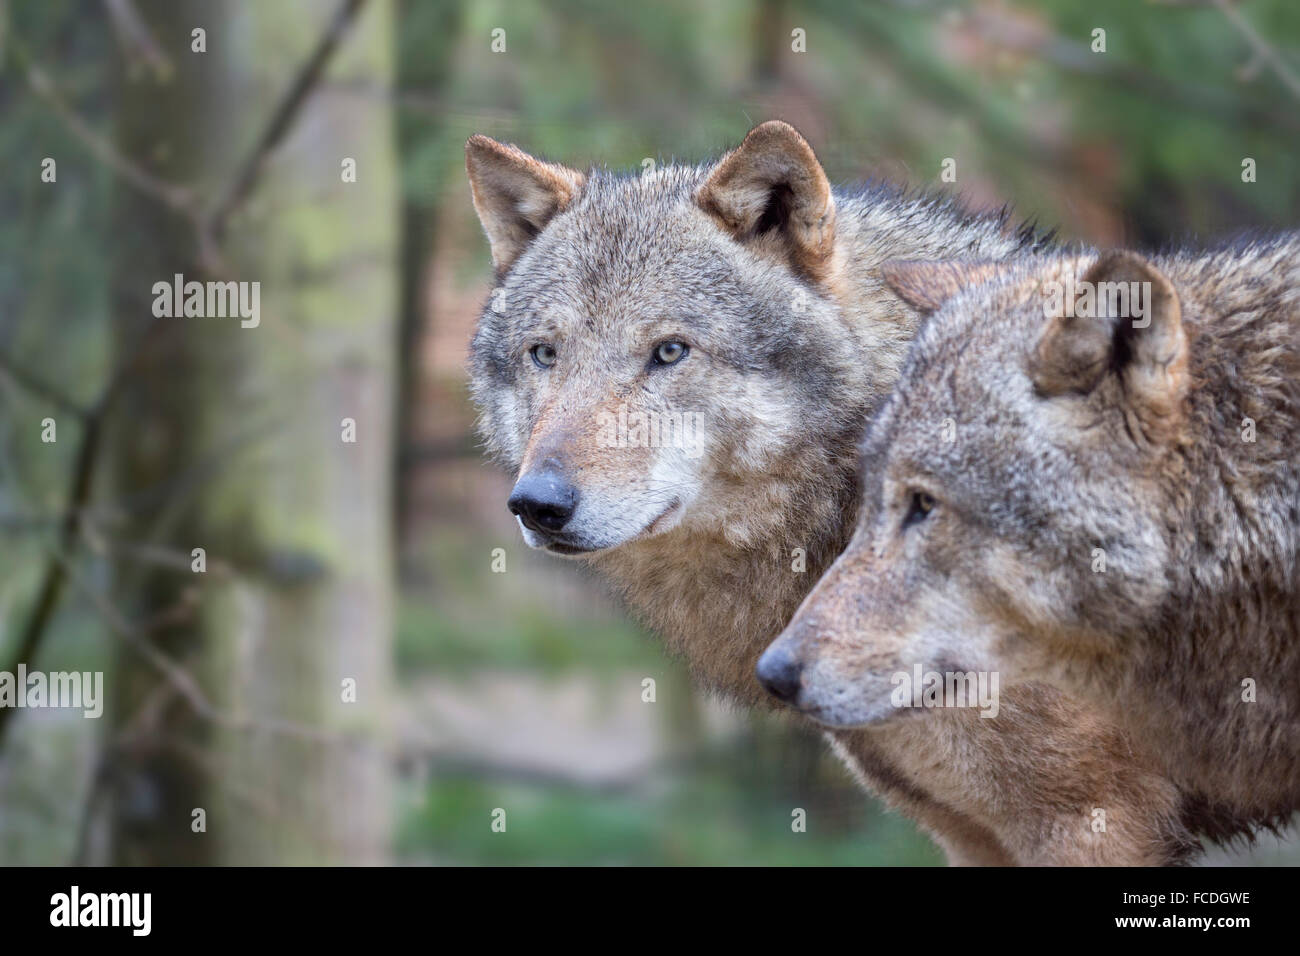 Netherlands, Kerkrade, Gaia Zoo. Gray wolf - Stock Image